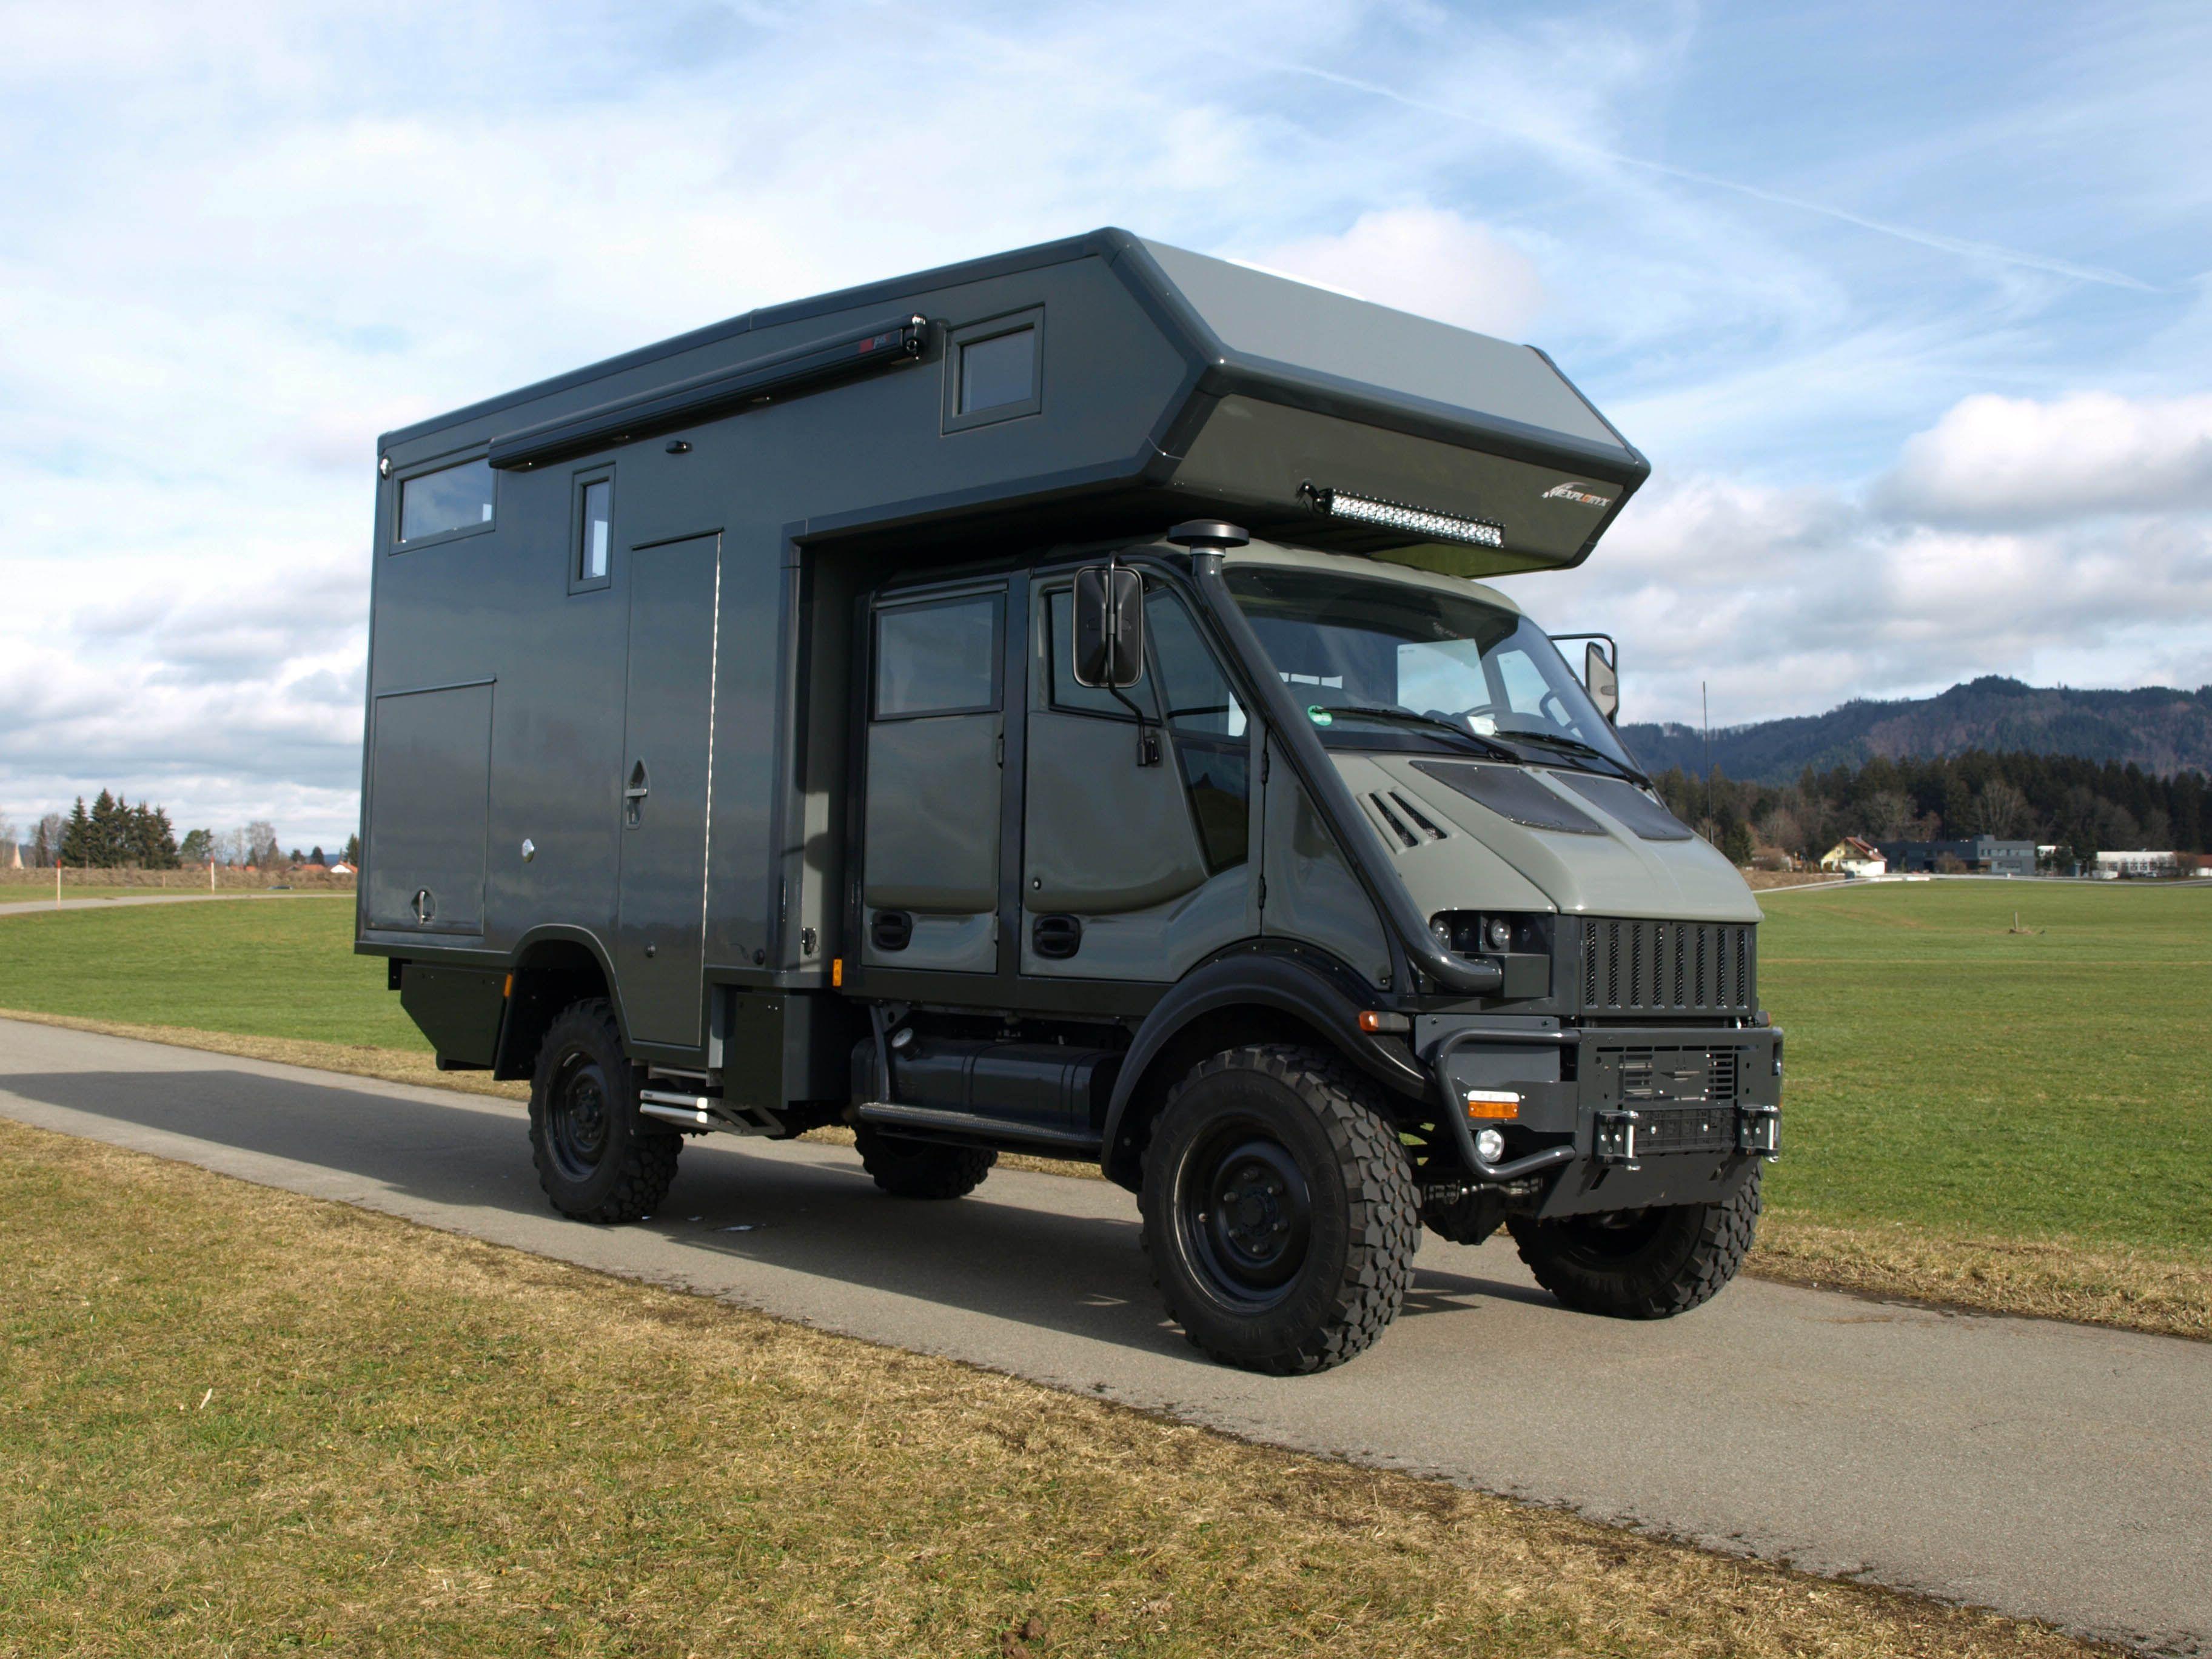 reisemobil von bremach expedition truck camiones. Black Bedroom Furniture Sets. Home Design Ideas